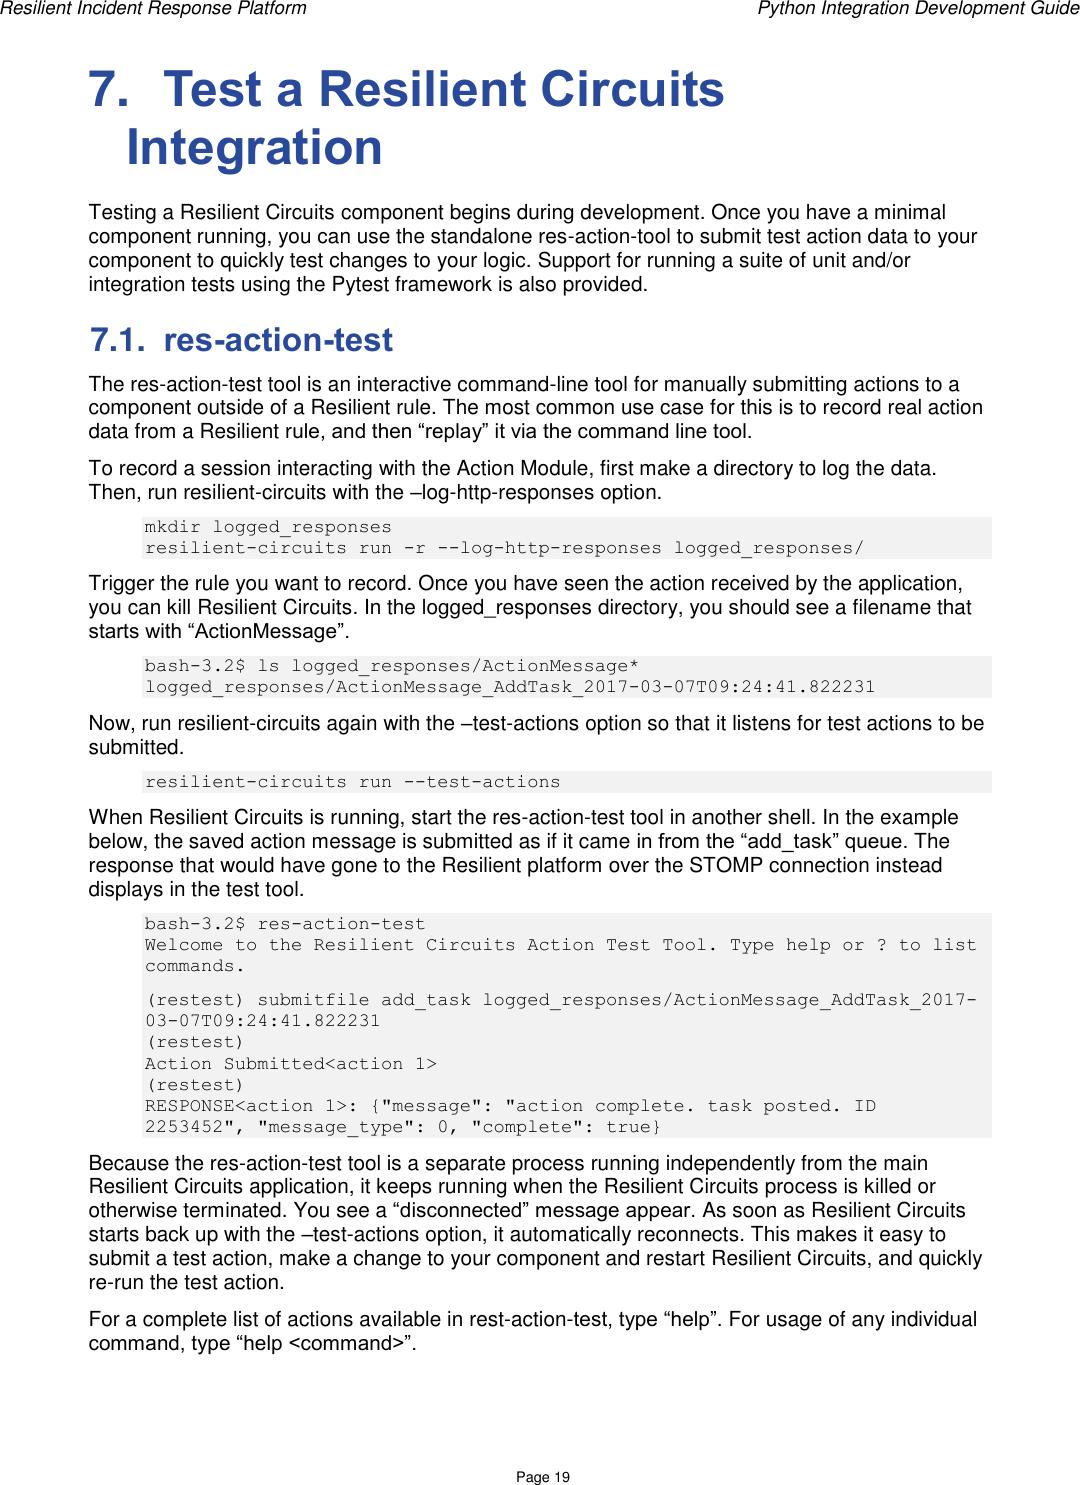 Resilient Python Integration Development Guide